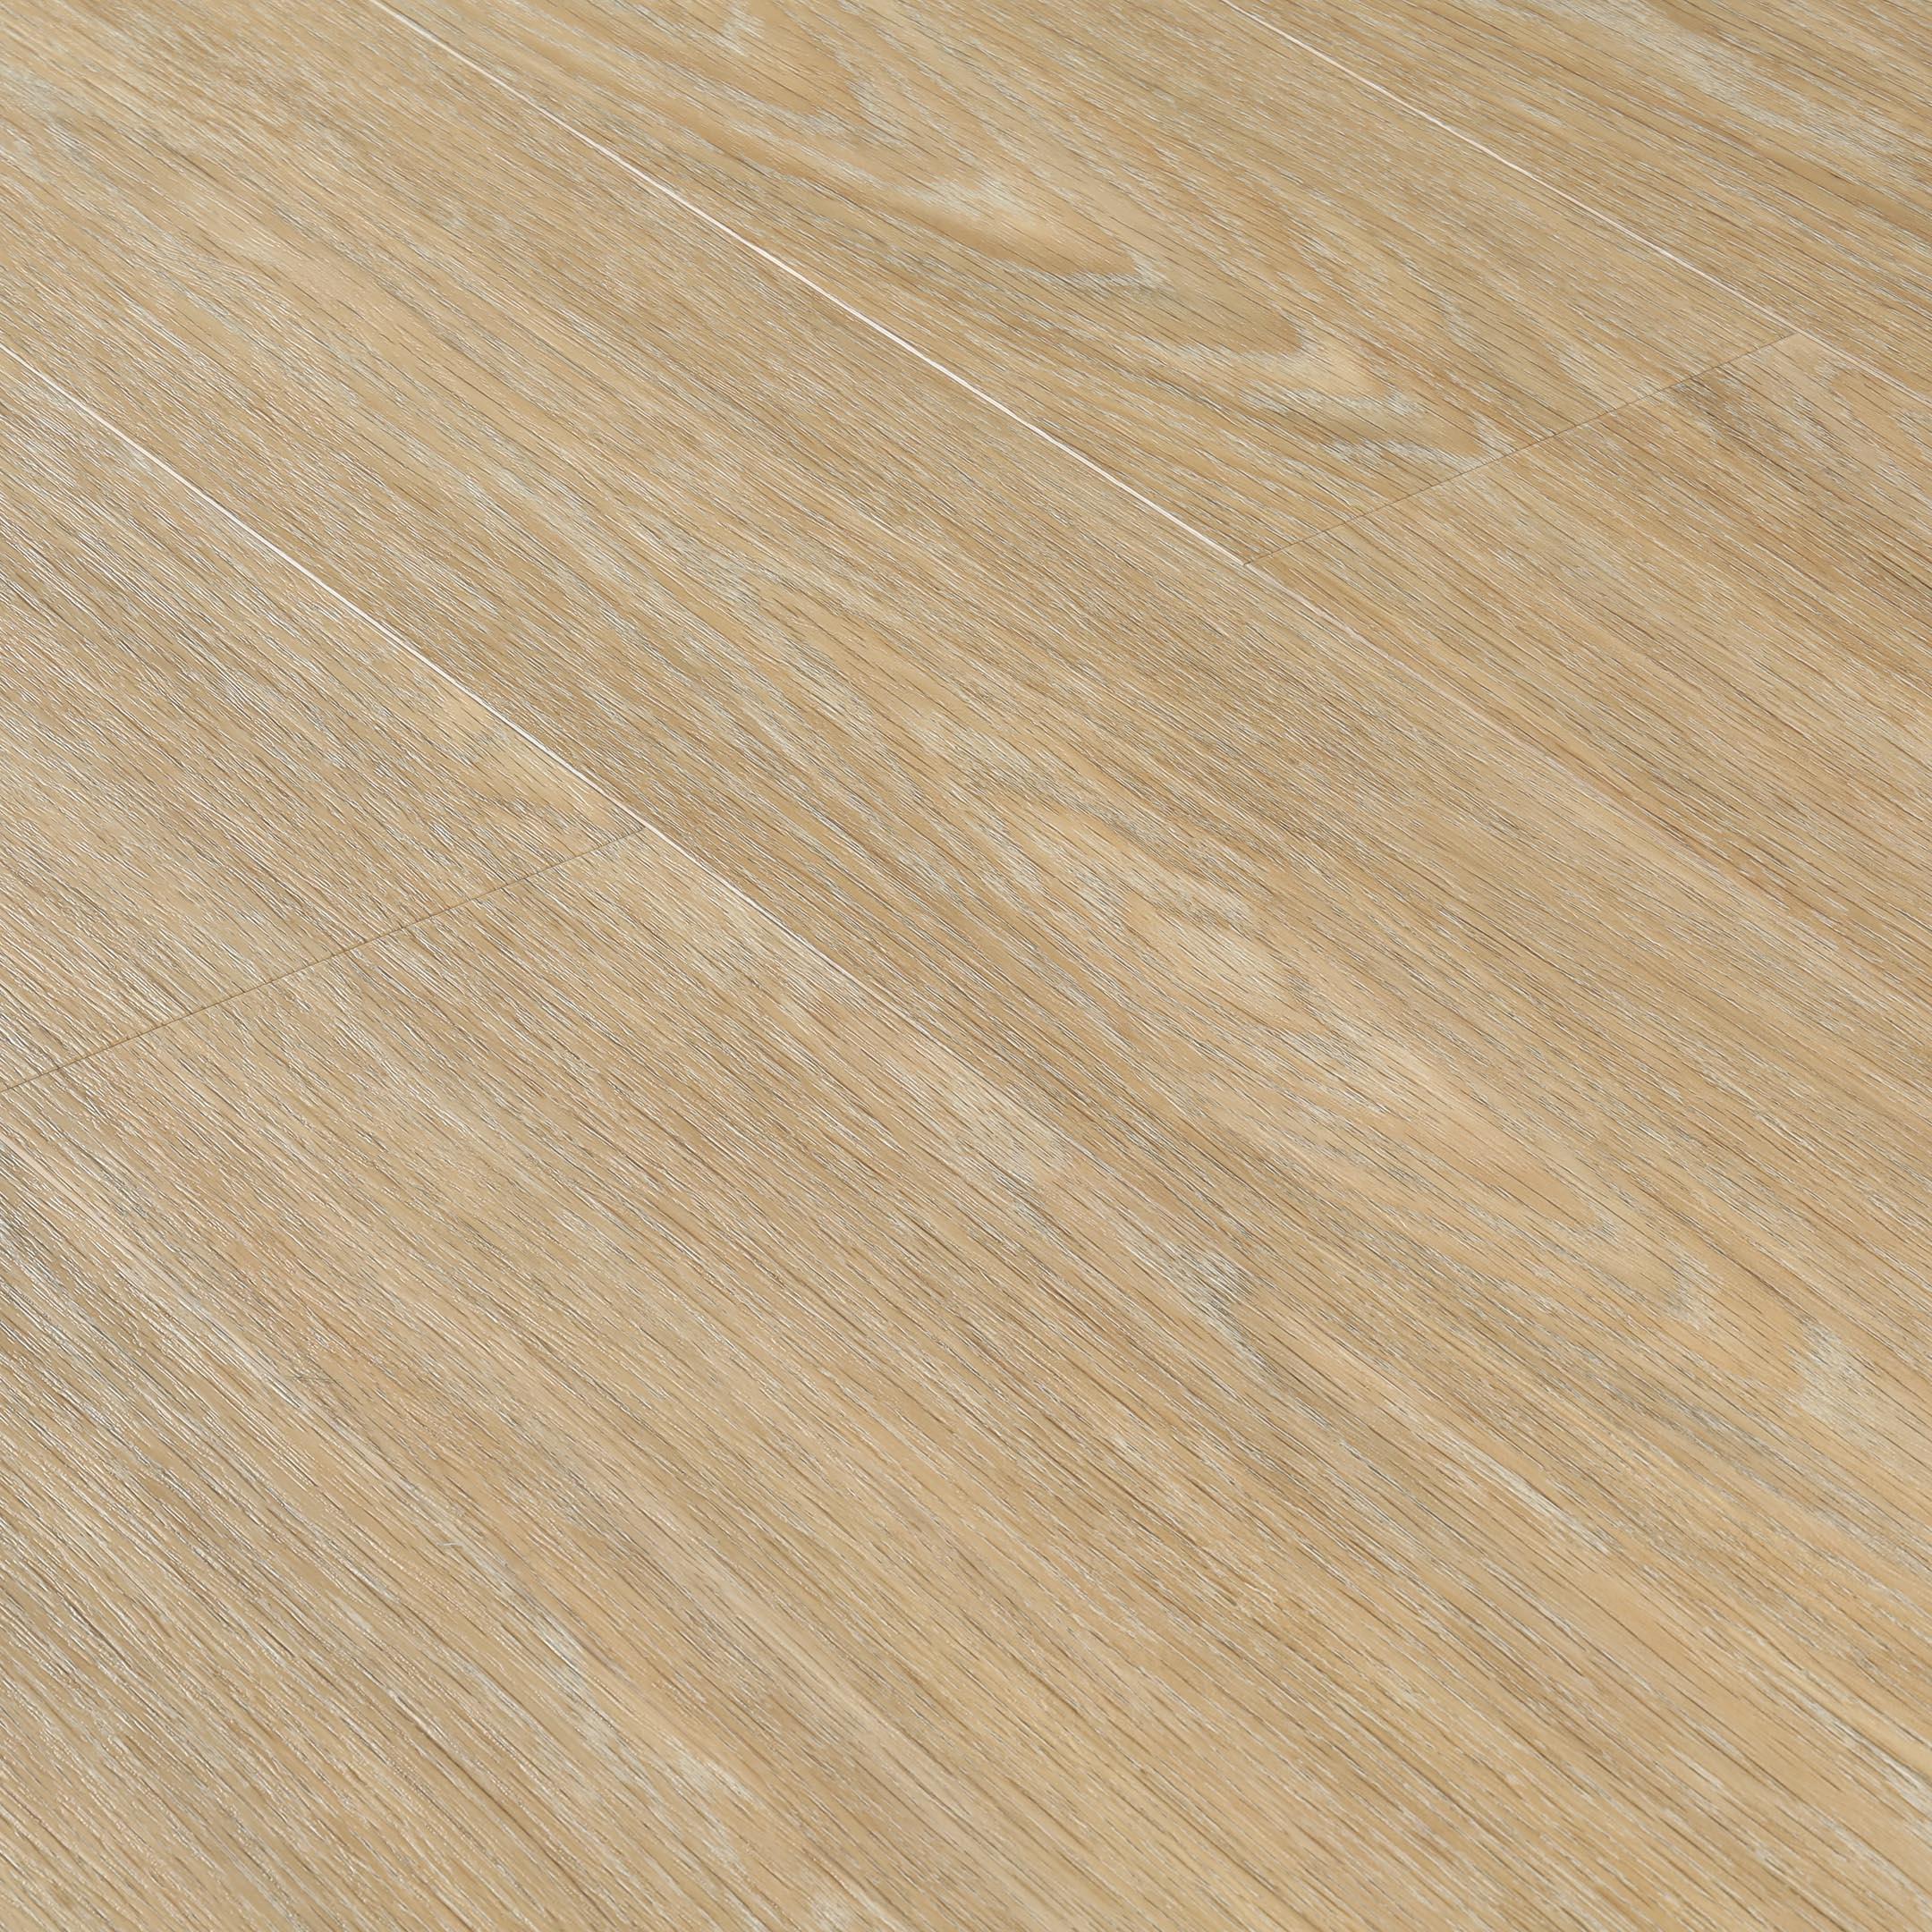 Плитка ПВХ Tarkett LOUNGE SIMPLE клеевая дуб бежевый 2,09 м.кв 3 мм